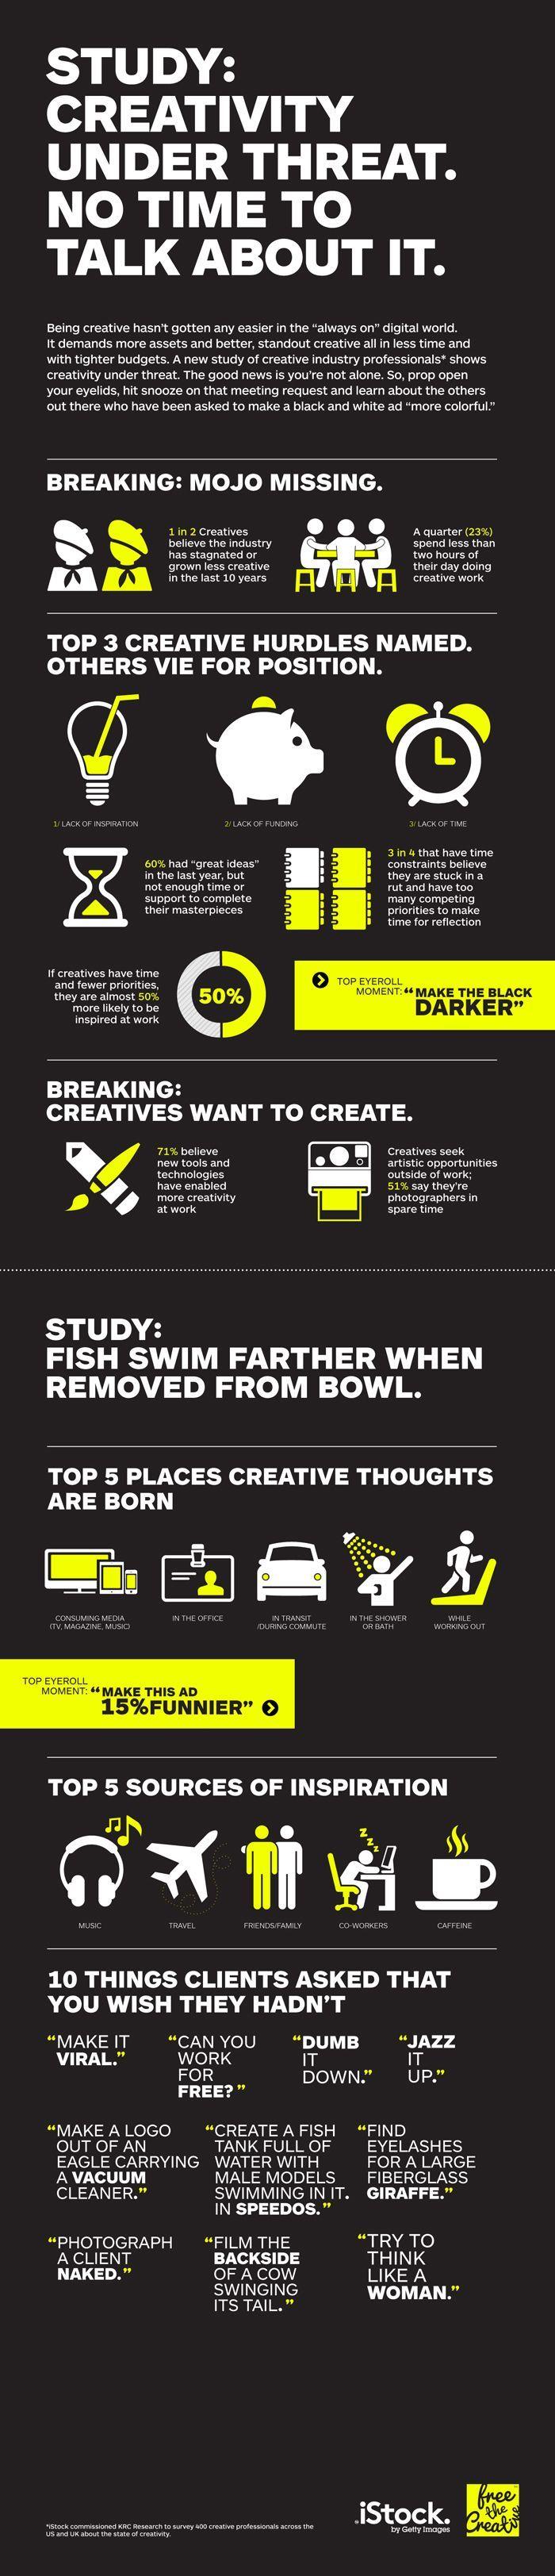 infografia sobre creatividad